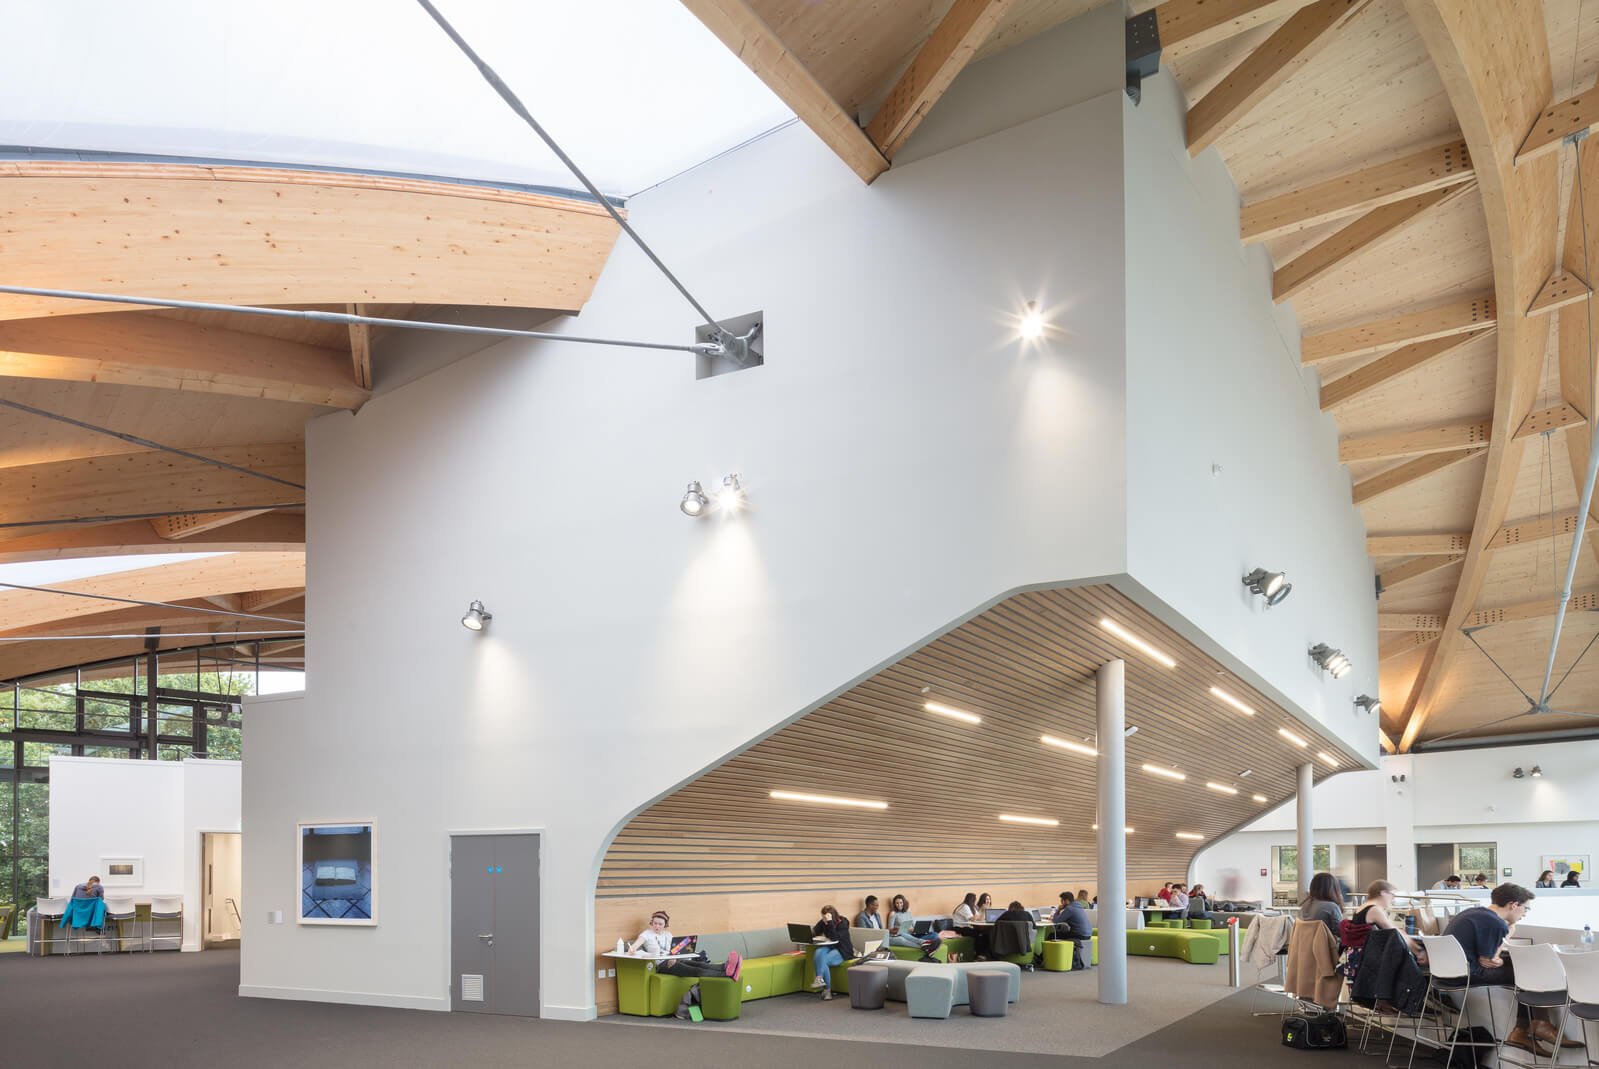 The University Of Warwick Oculus Building Internal